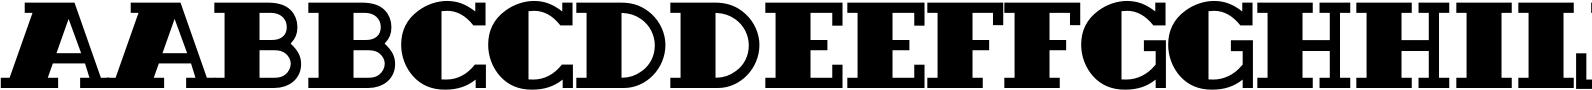 Dextor